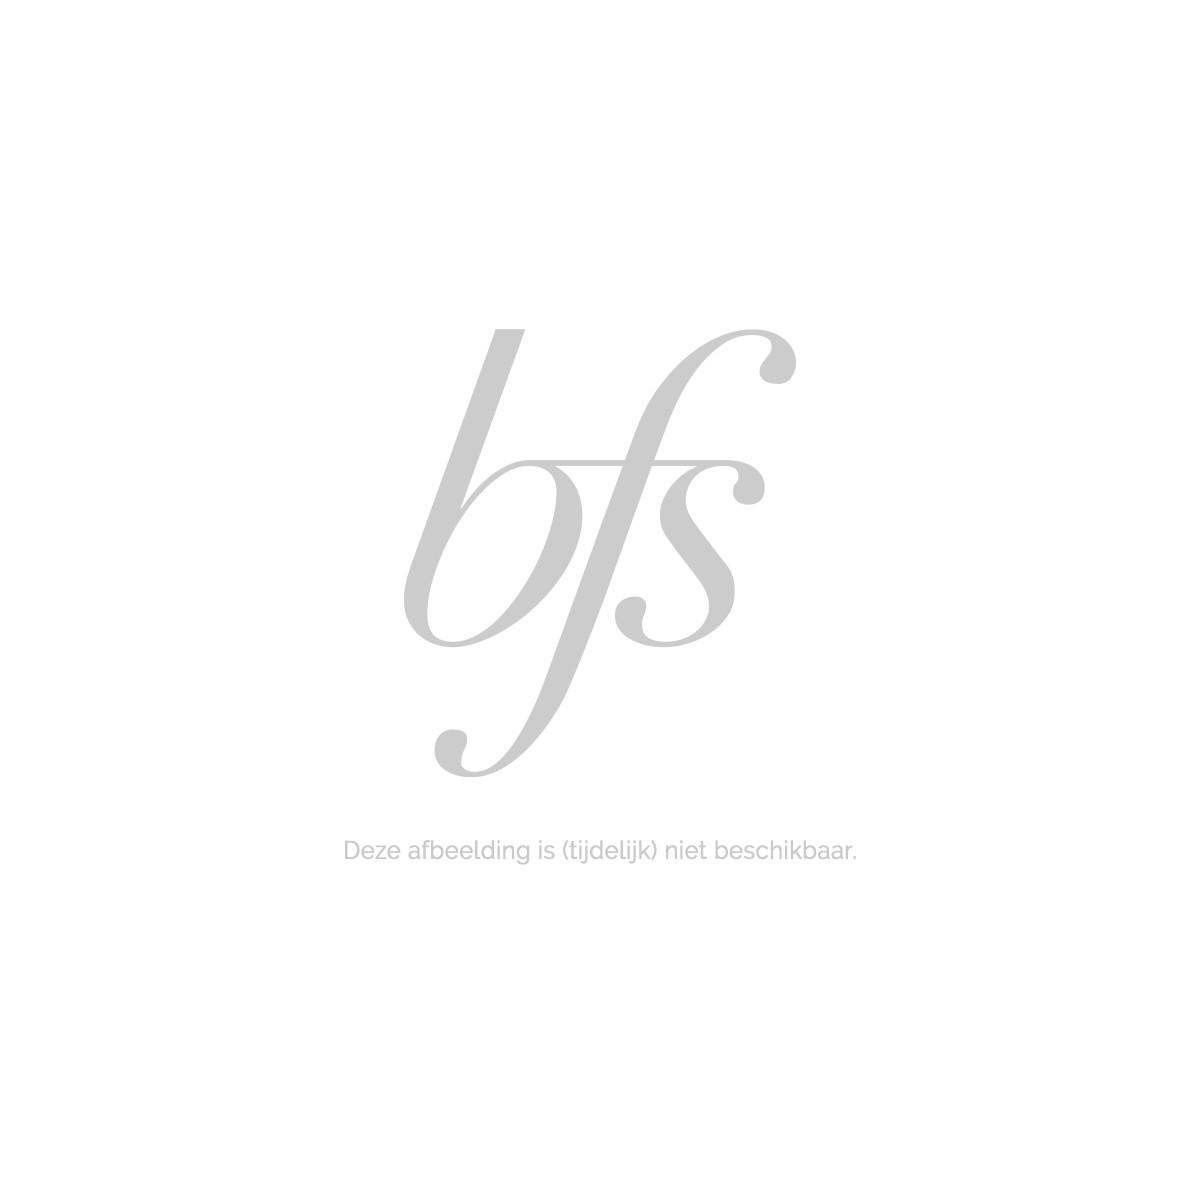 Pupa IM Matt Lip Fluid 013 Sable Brown